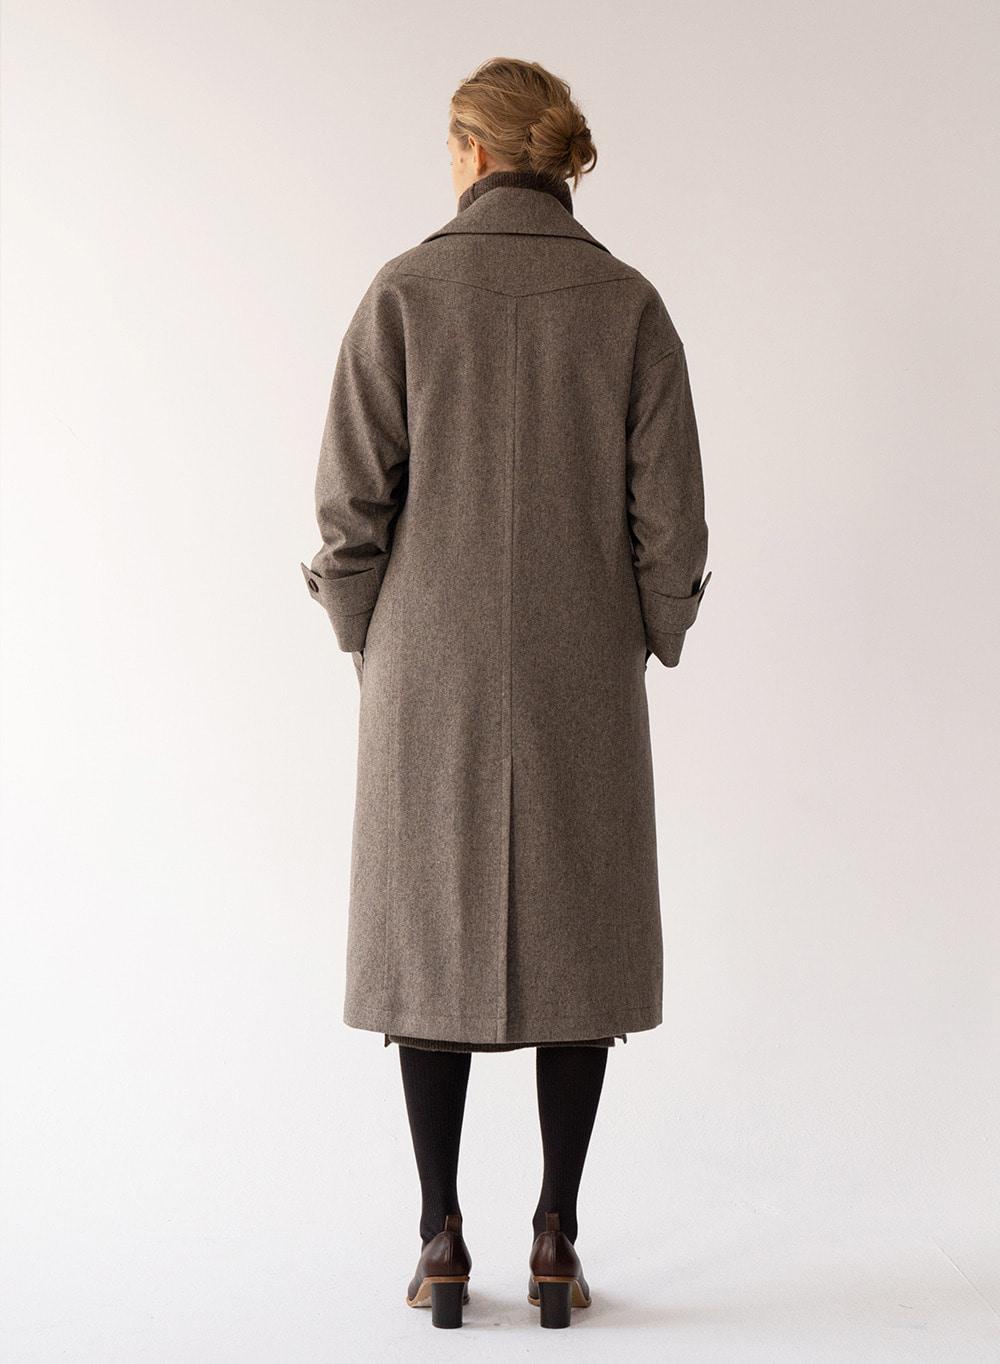 [FW20 ESSENTIAL] Double Coat Olive-melange